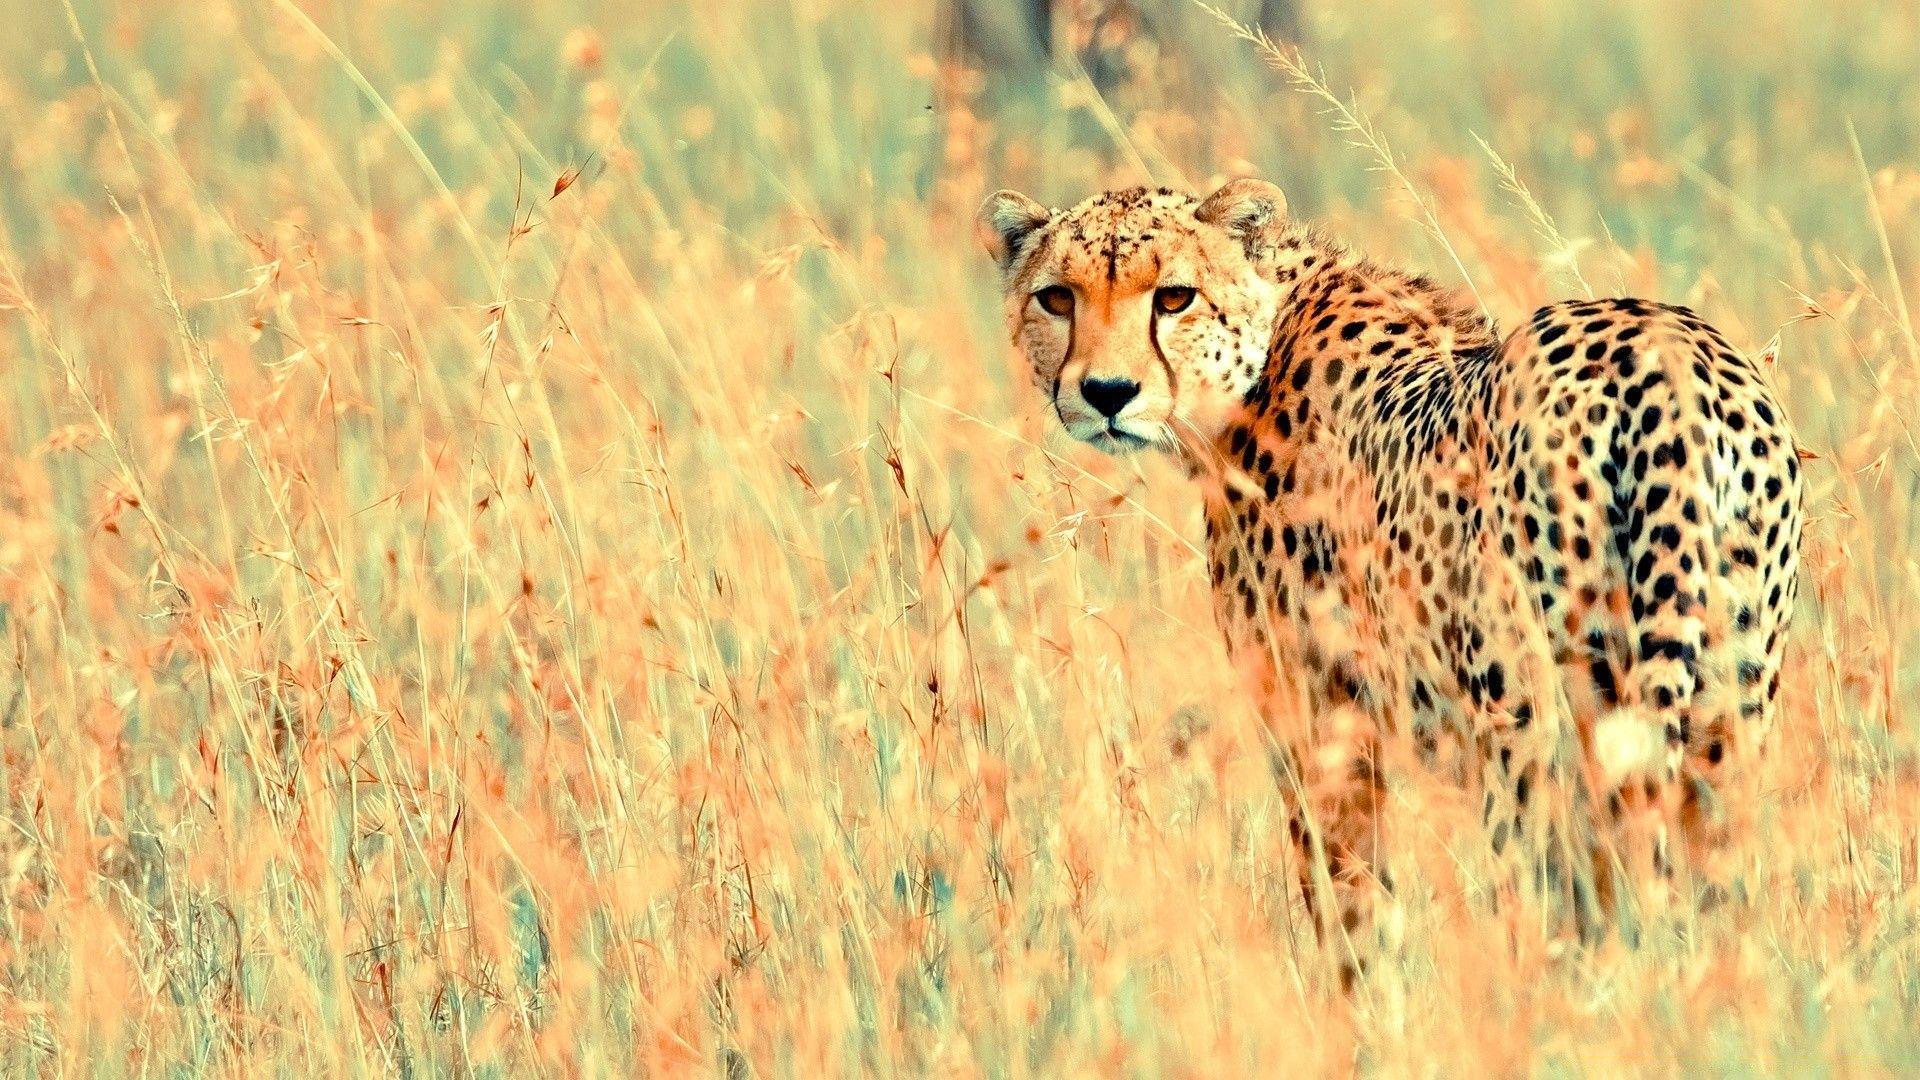 Animals, Wildlife, Mammal, Nature, Grass, Animal, Wild